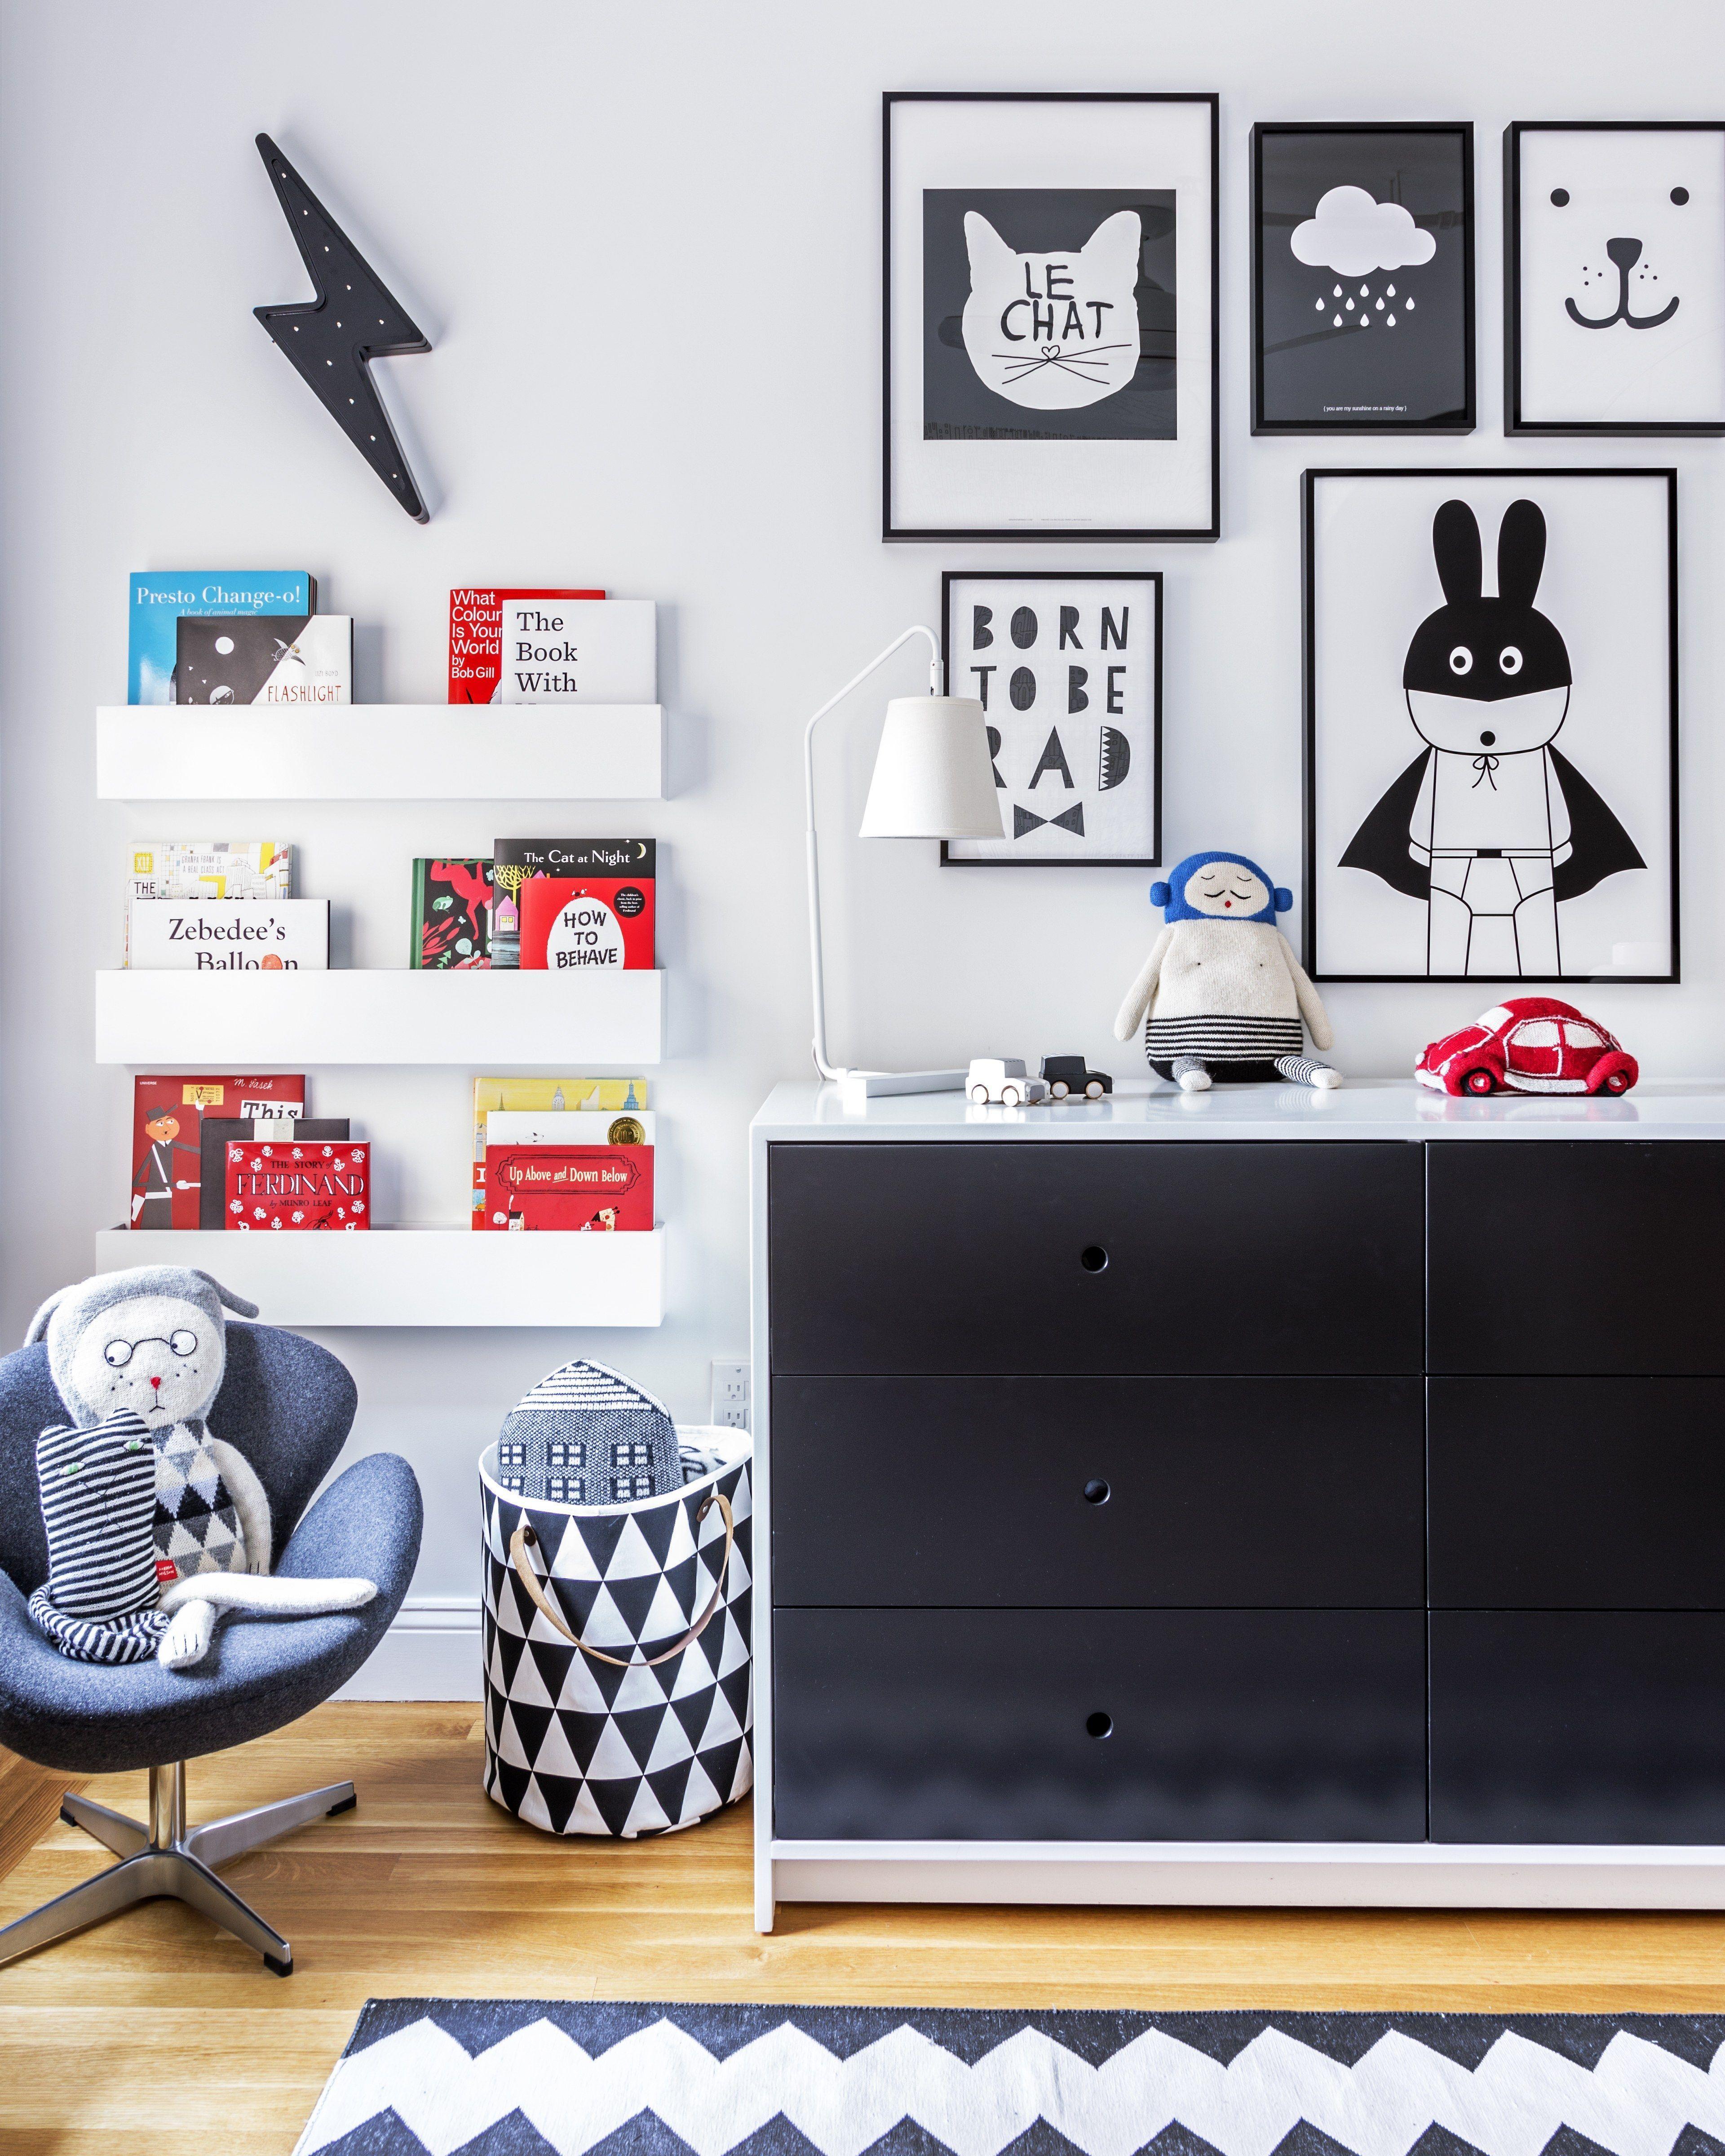 Kids Room Ideas Home Design For Sophisticated Kids Room Decor